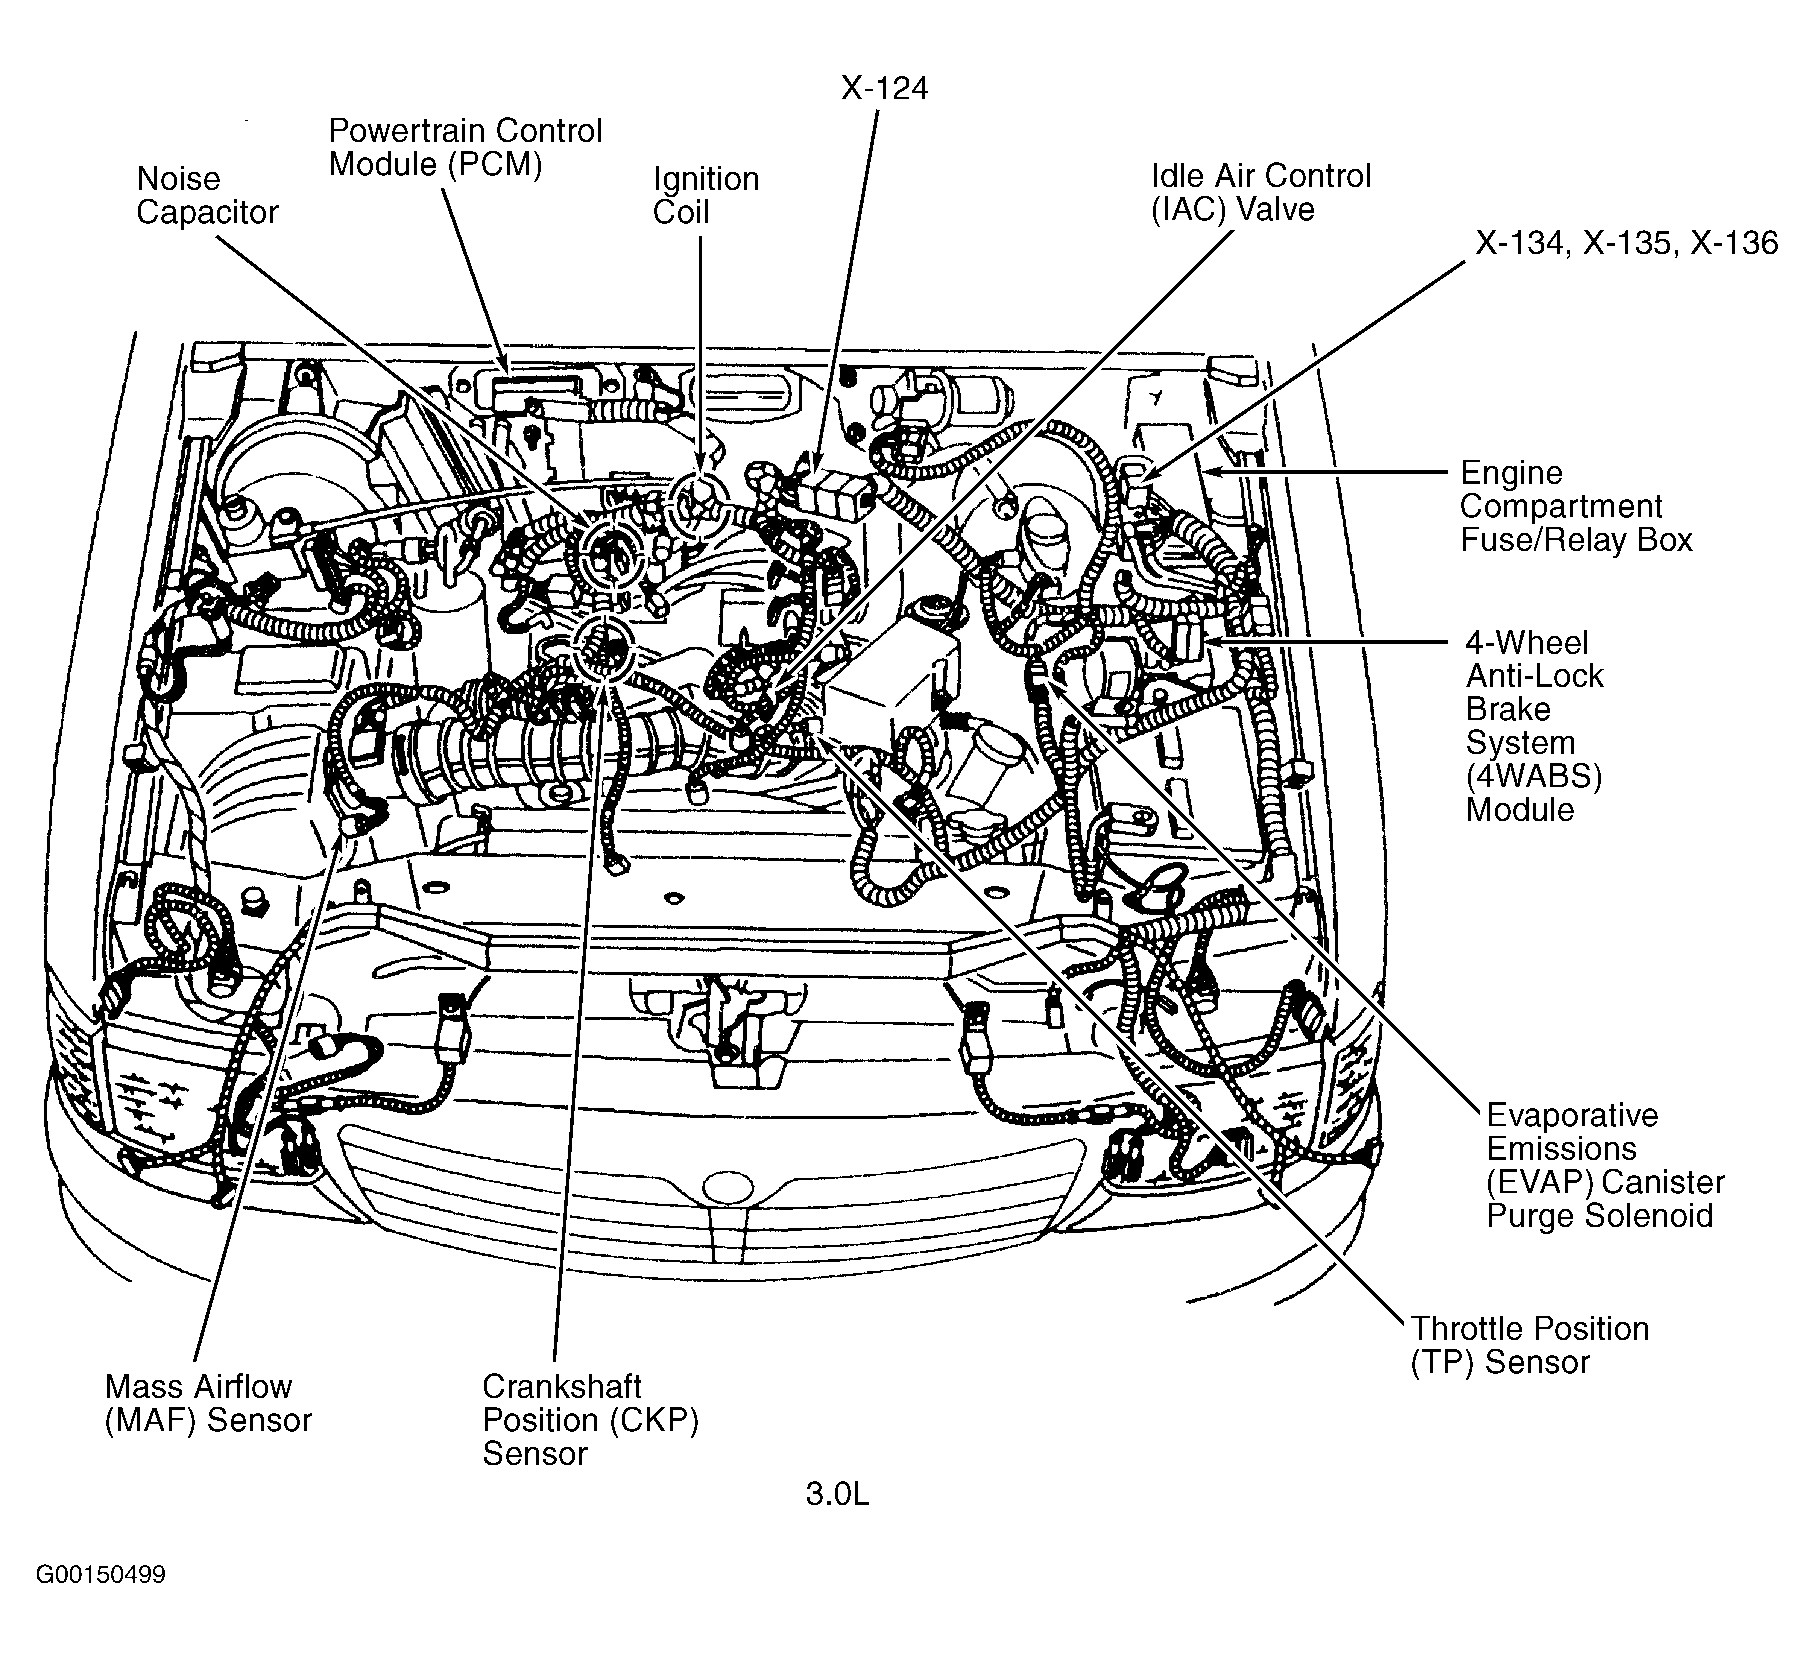 Mazda 626 Engine Diagram Mazda 626 Engine Diagram Lovely Diagram Mazda 6 Engine Diagram